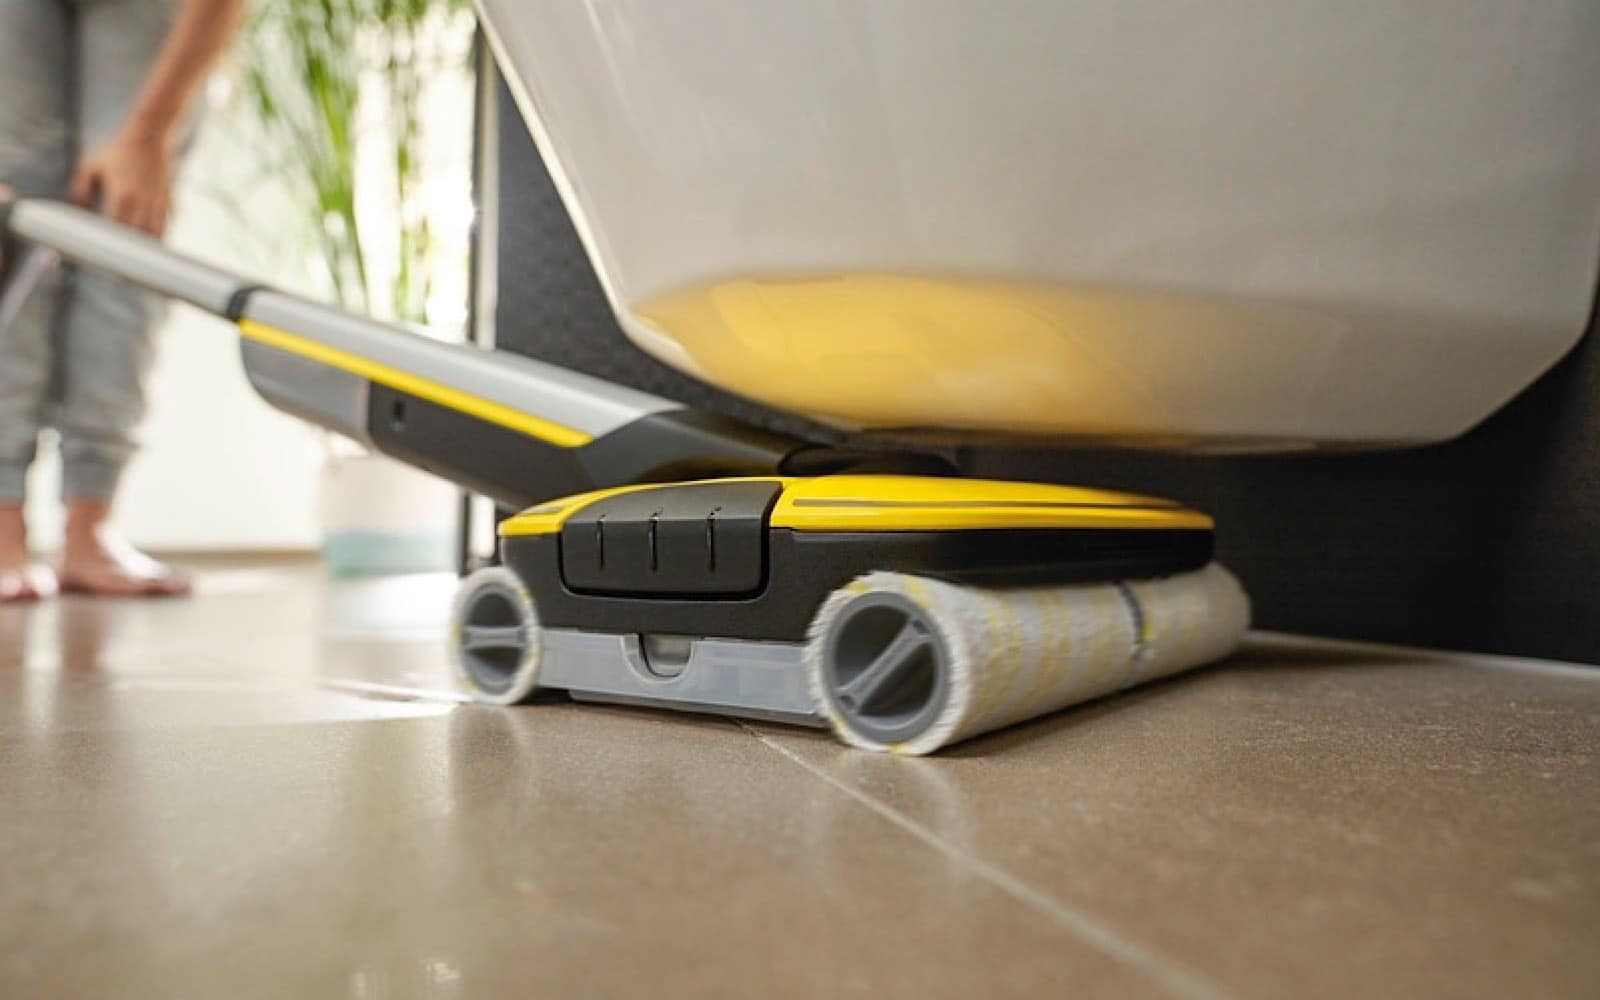 Karcher FC 7 cordless floor cleaner